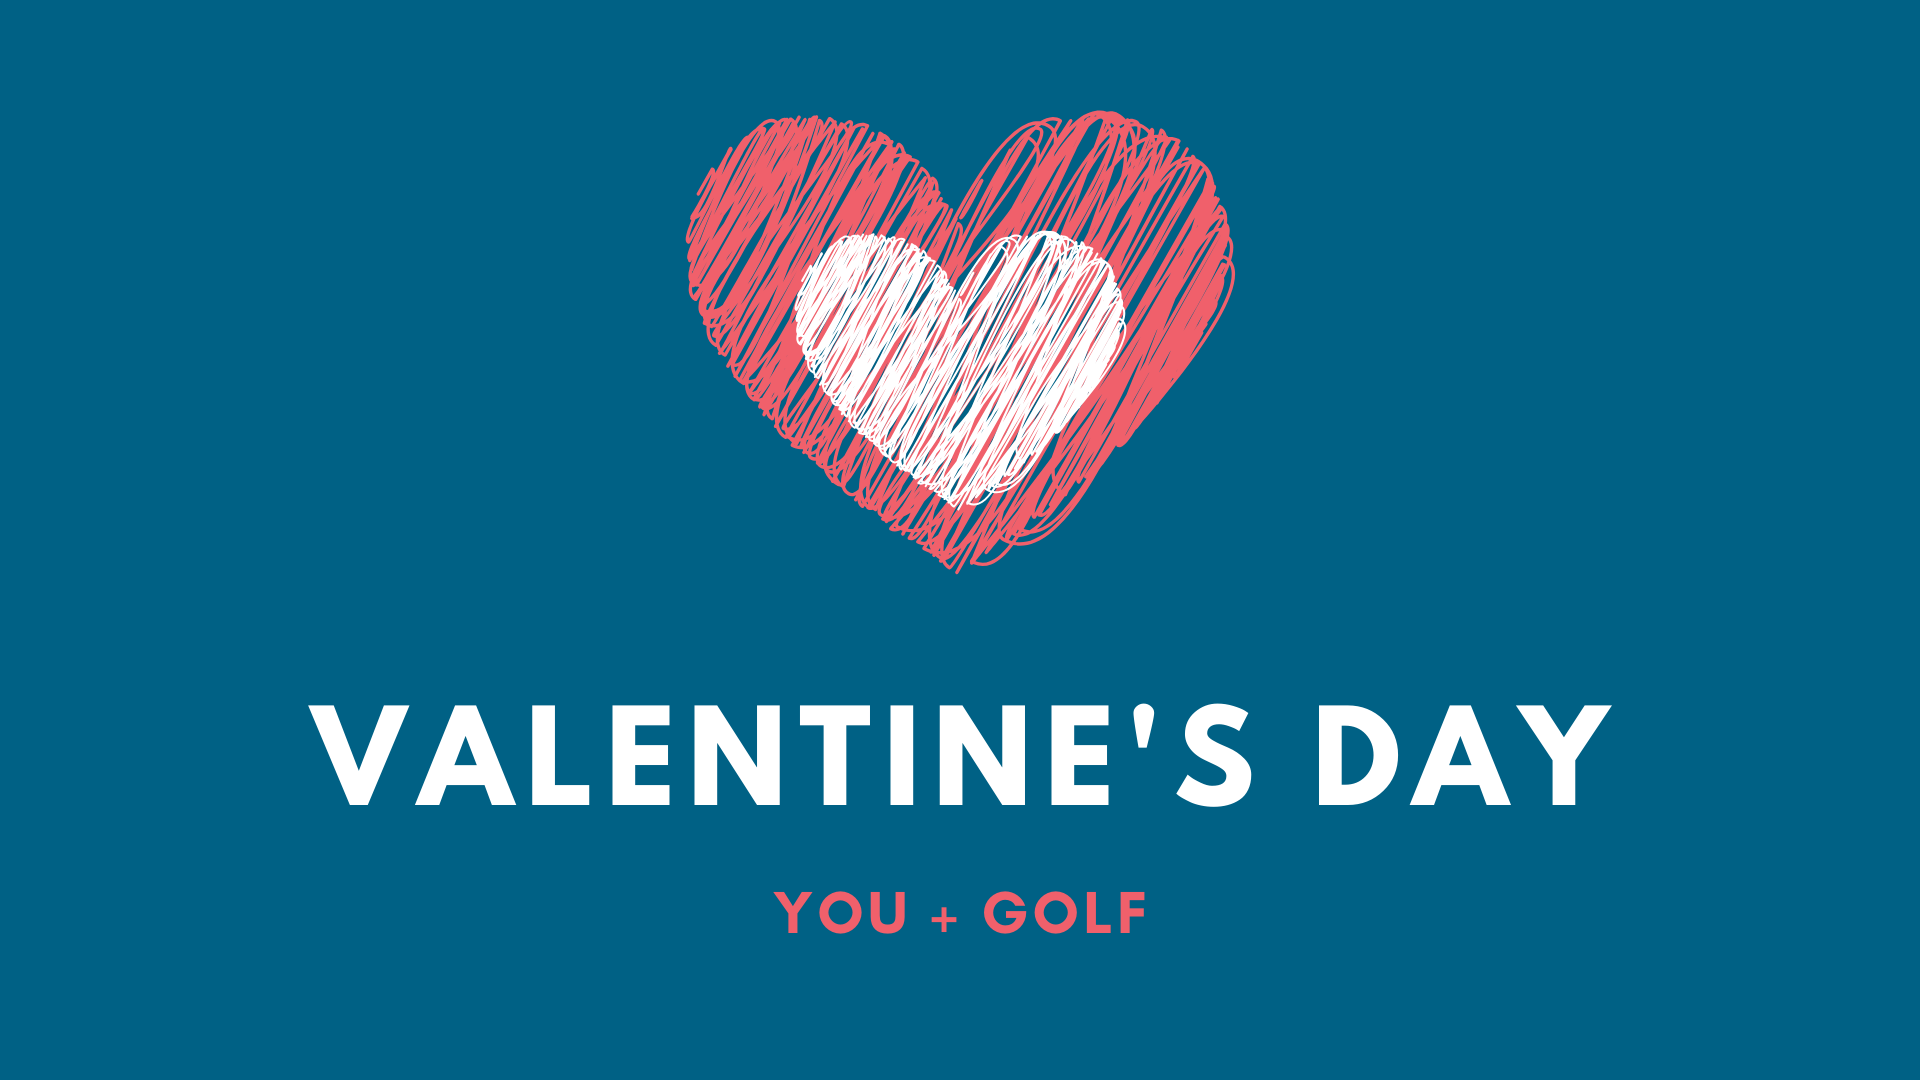 You + Golf 💓